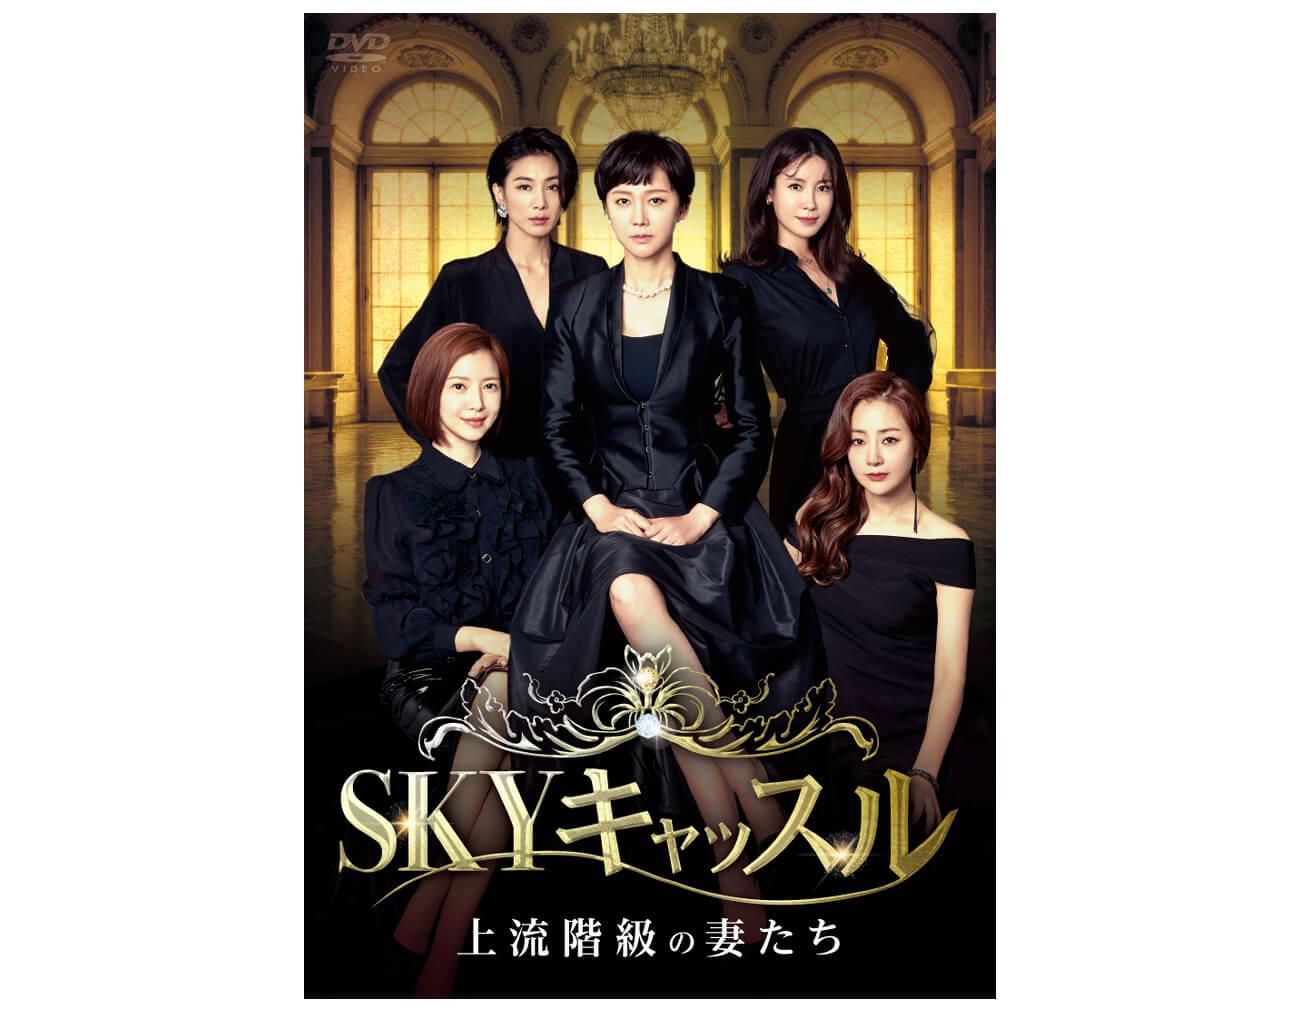 『SKYキャッスル~上流階級の妻たち~』